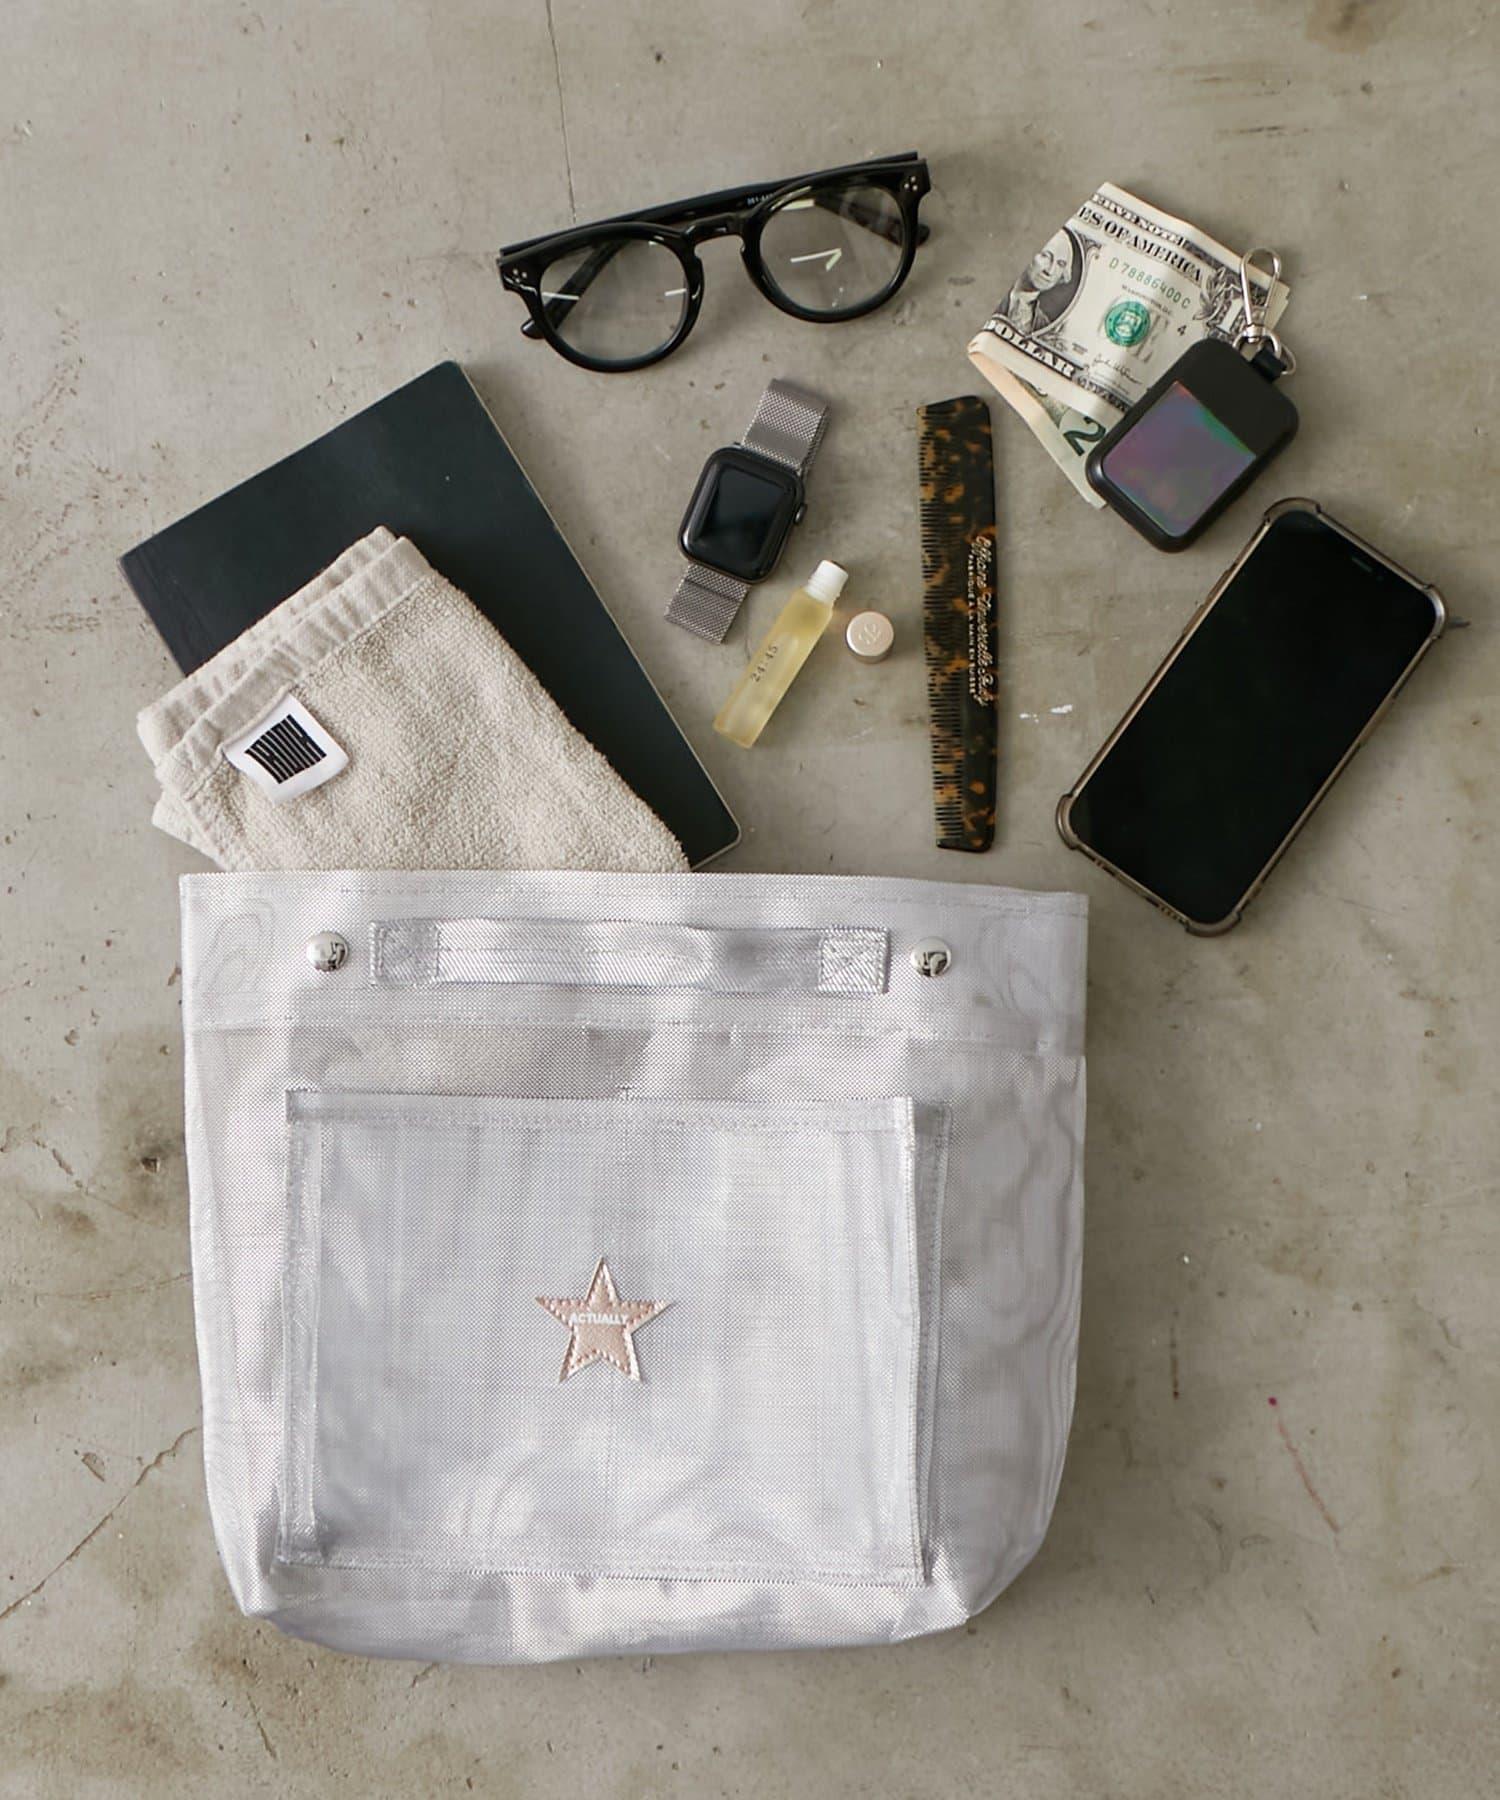 BIRTHDAY BAR(バースデイバー) メッシュ バッグインバッグ / BAG IN BAG